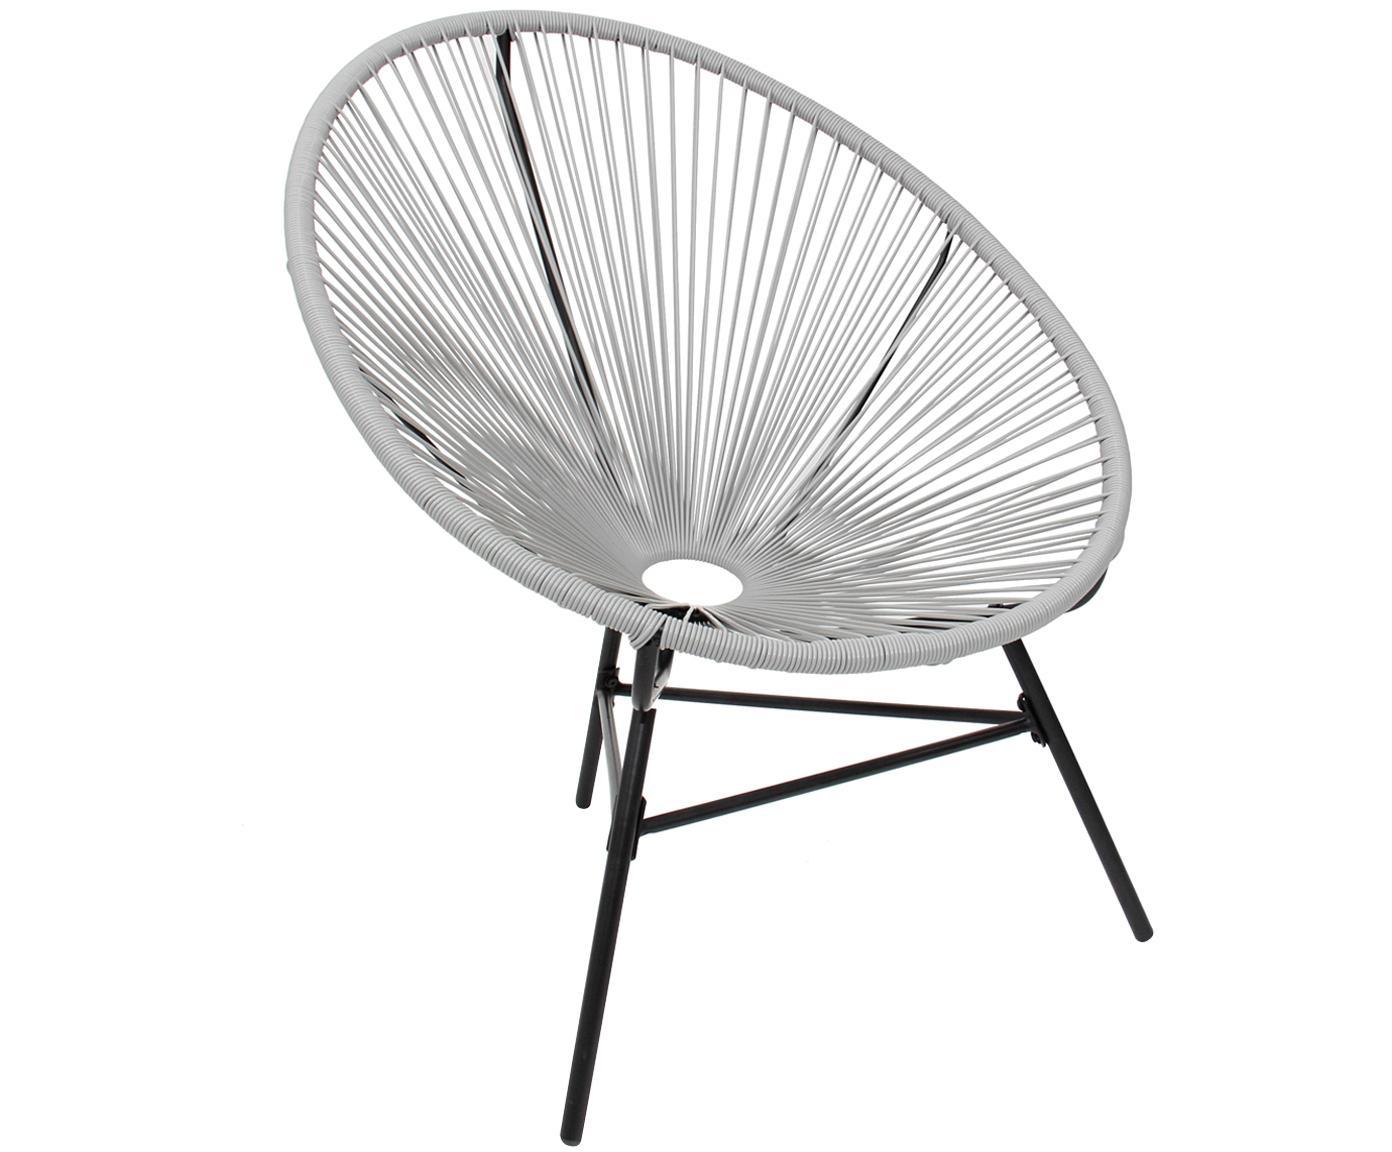 Retro fauteuil Bahia, Frame: Metaal, Zitvlak: Polyethyleen-vlechtwerk, Vlechtwerk: Grijs. Frame: Zwart, 81 x 88 cm